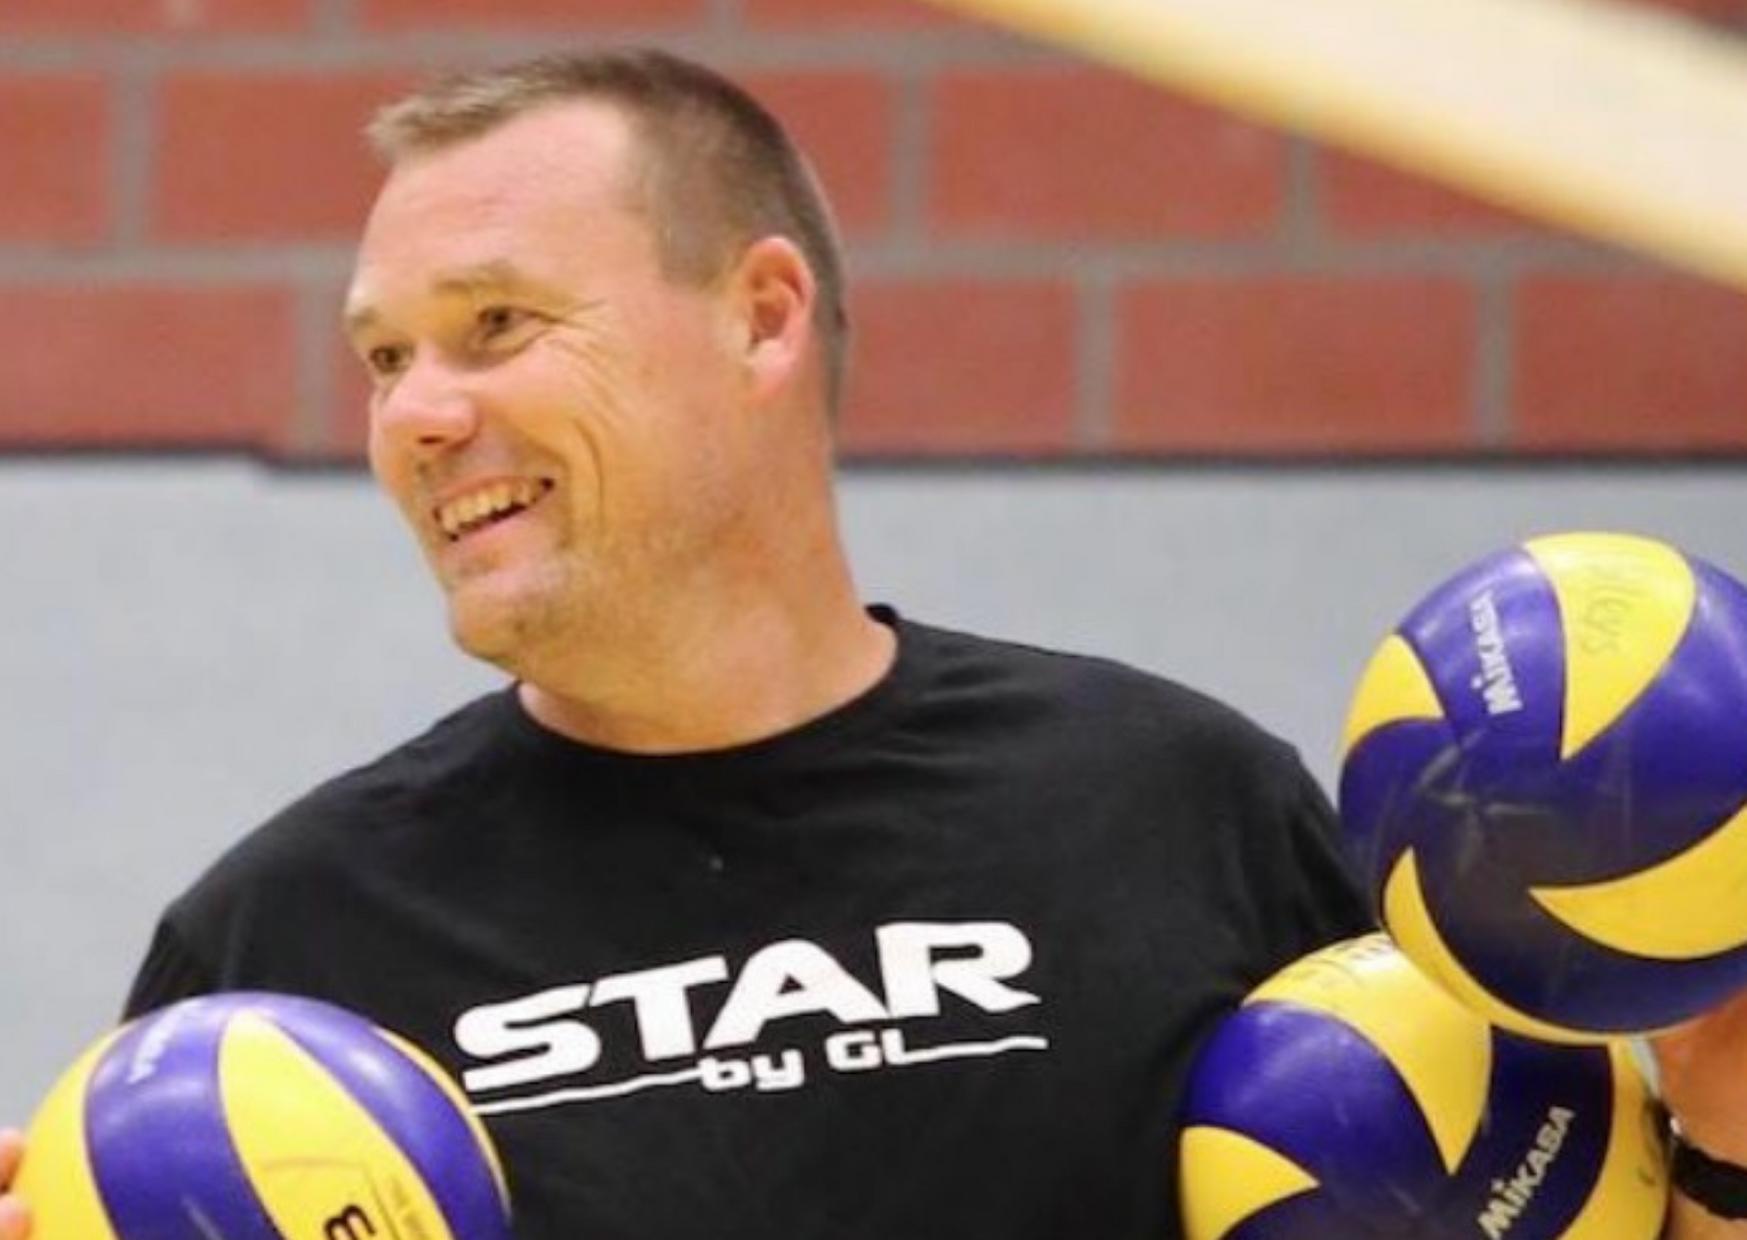 Arno van Solkema nieuwe hoofdtrainer/coach van Veracles Dames 1